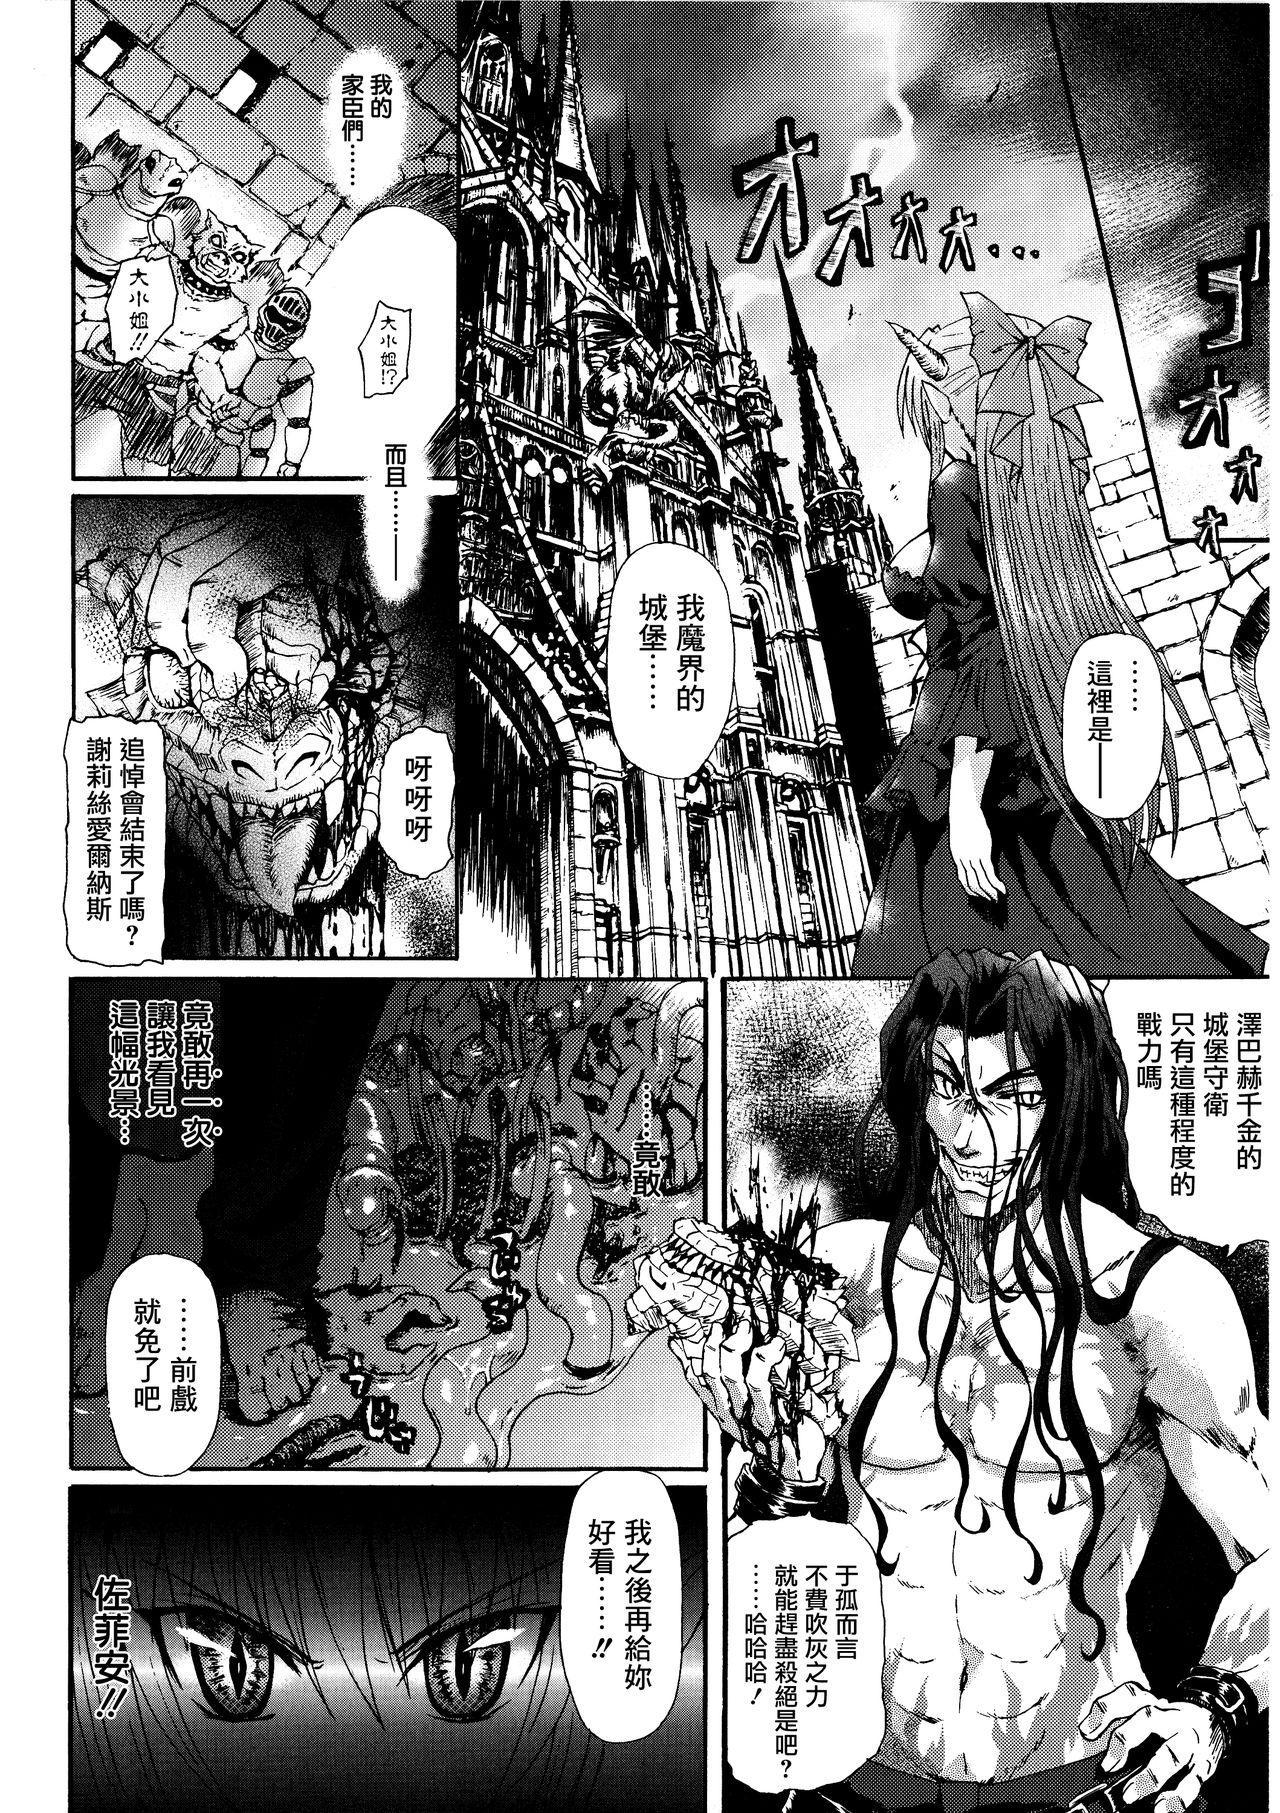 Ma ga Ochiru Yoru Demonic Imitator CH.1-7 126